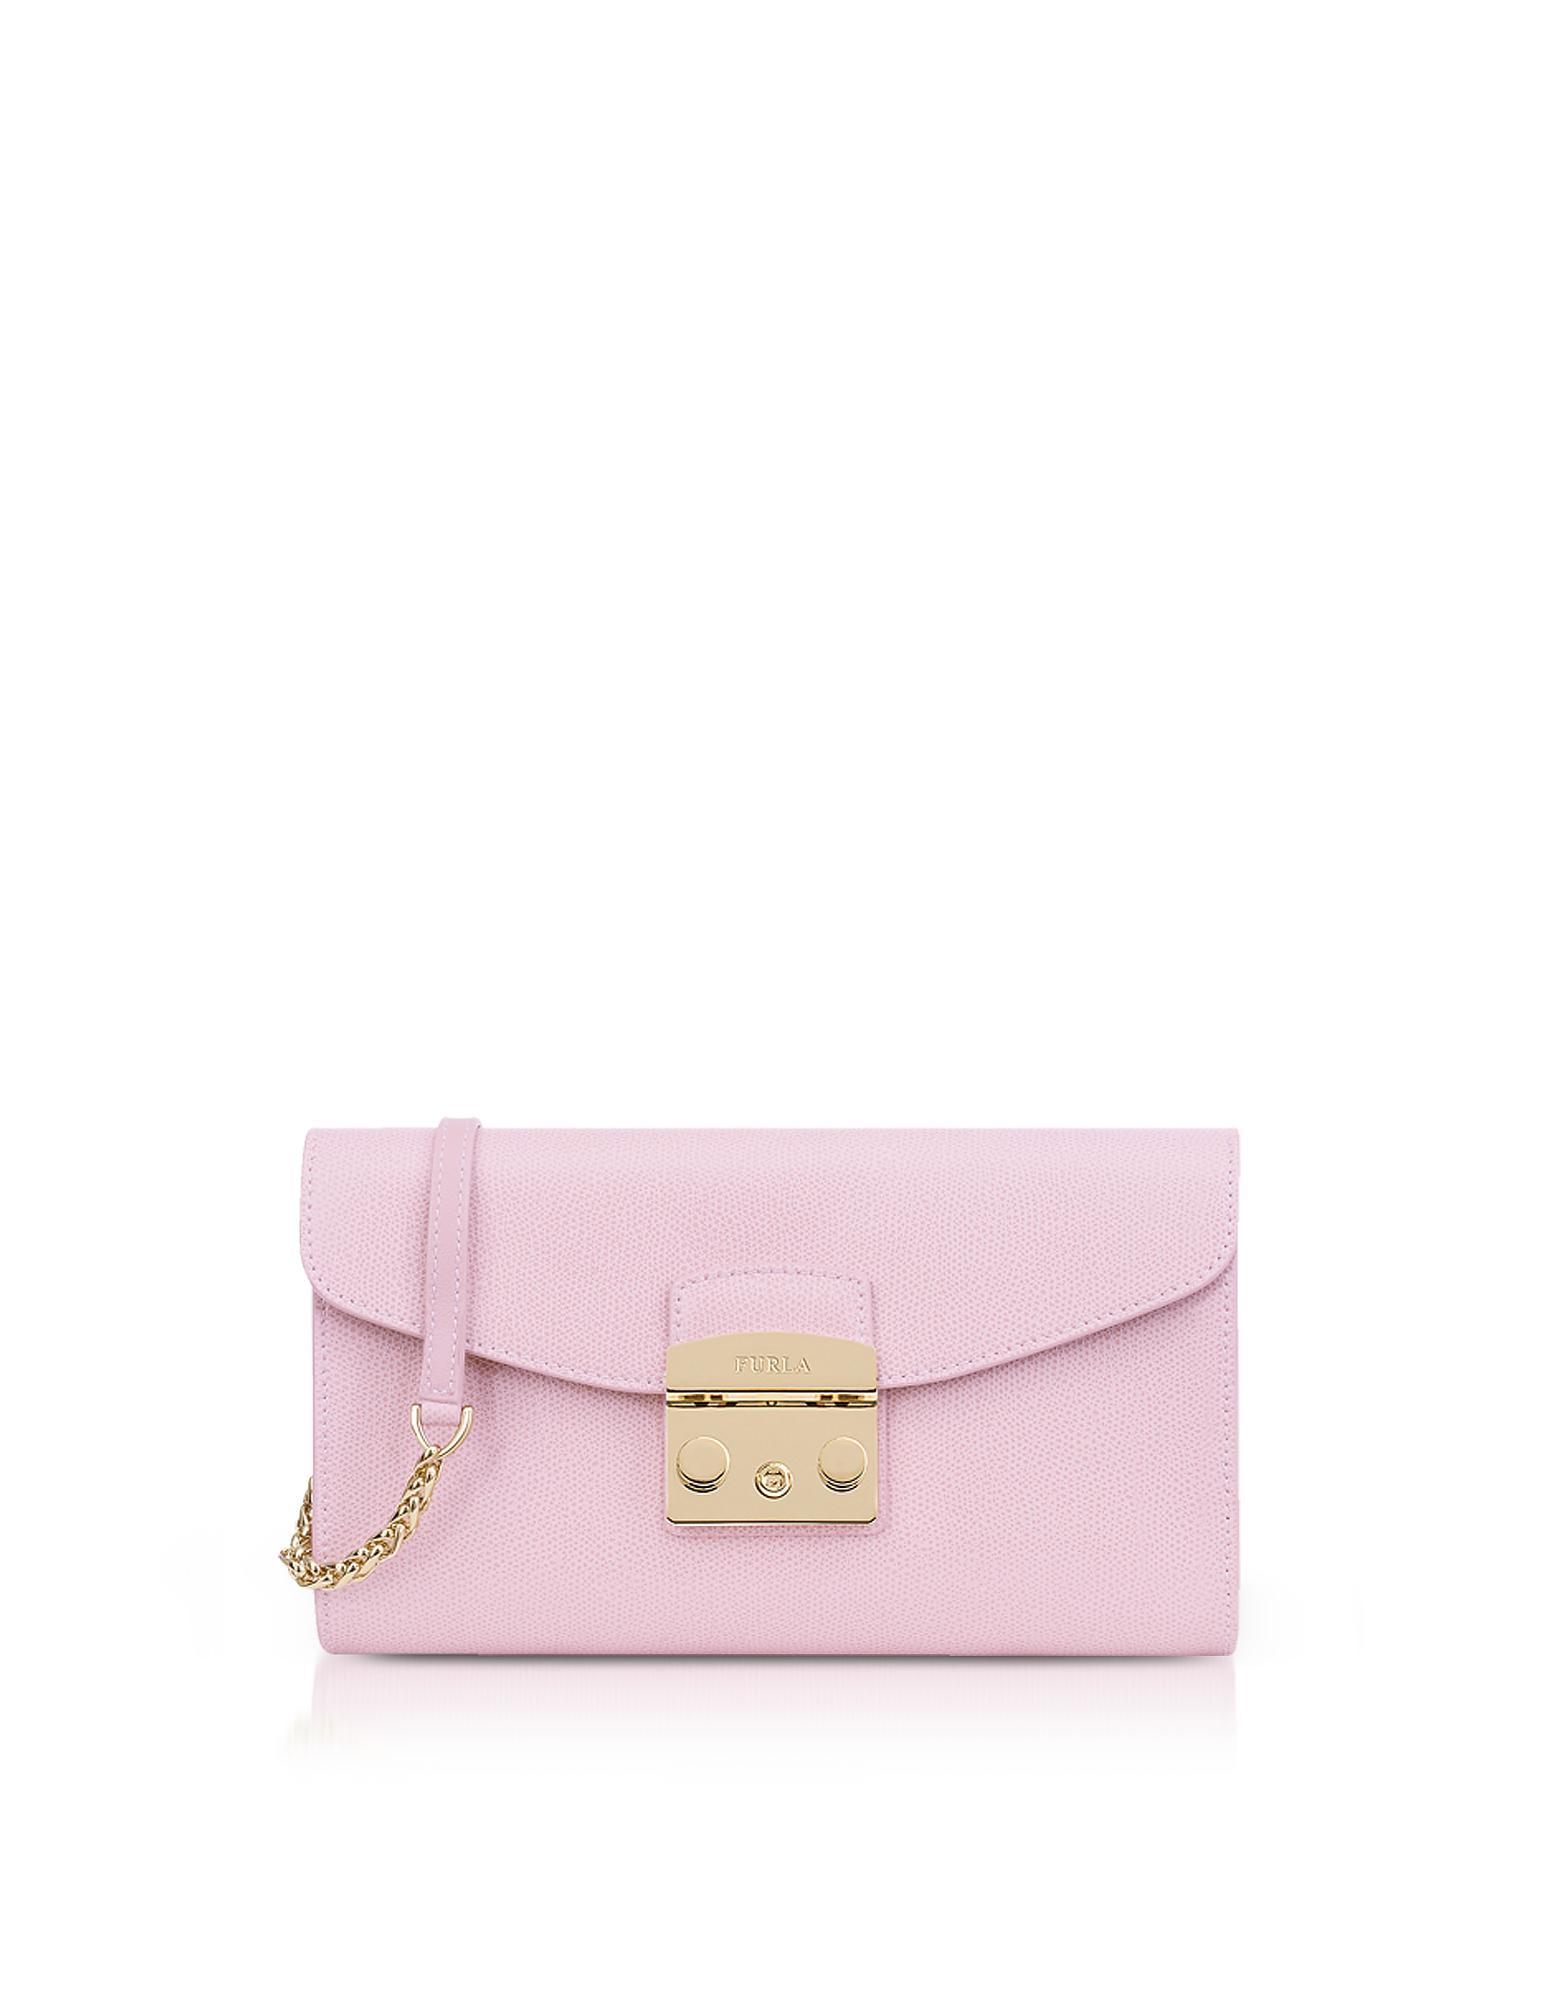 6bb4f7f00b00 Furla - Pink Camelia Lizard Printed Leather Metropolis Small Clutch W chain  Strap - Lyst. View fullscreen